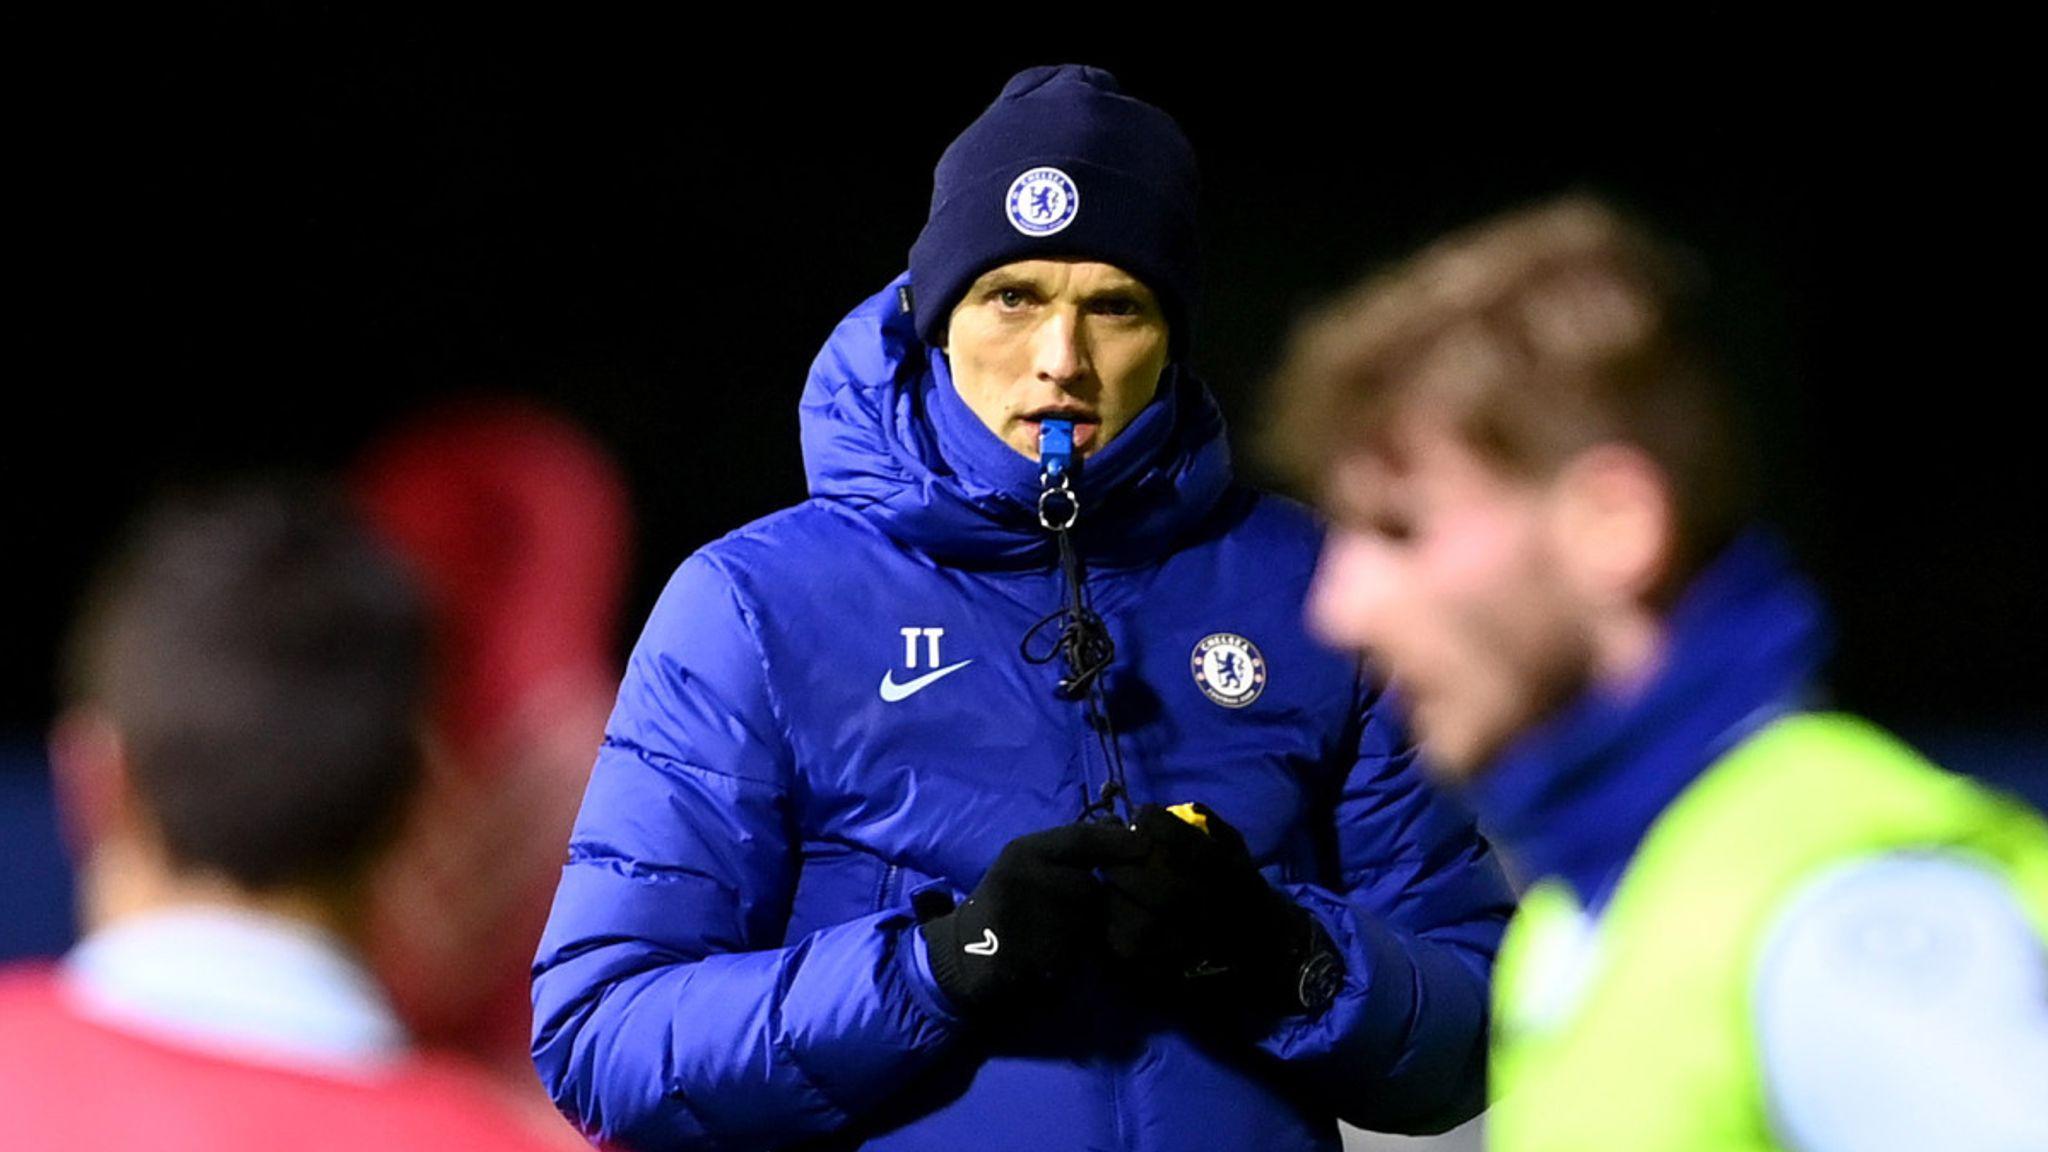 Thomas Tuchel named Chelsea head coach after Frank Lampard sacking |  Football News | Sky Sports